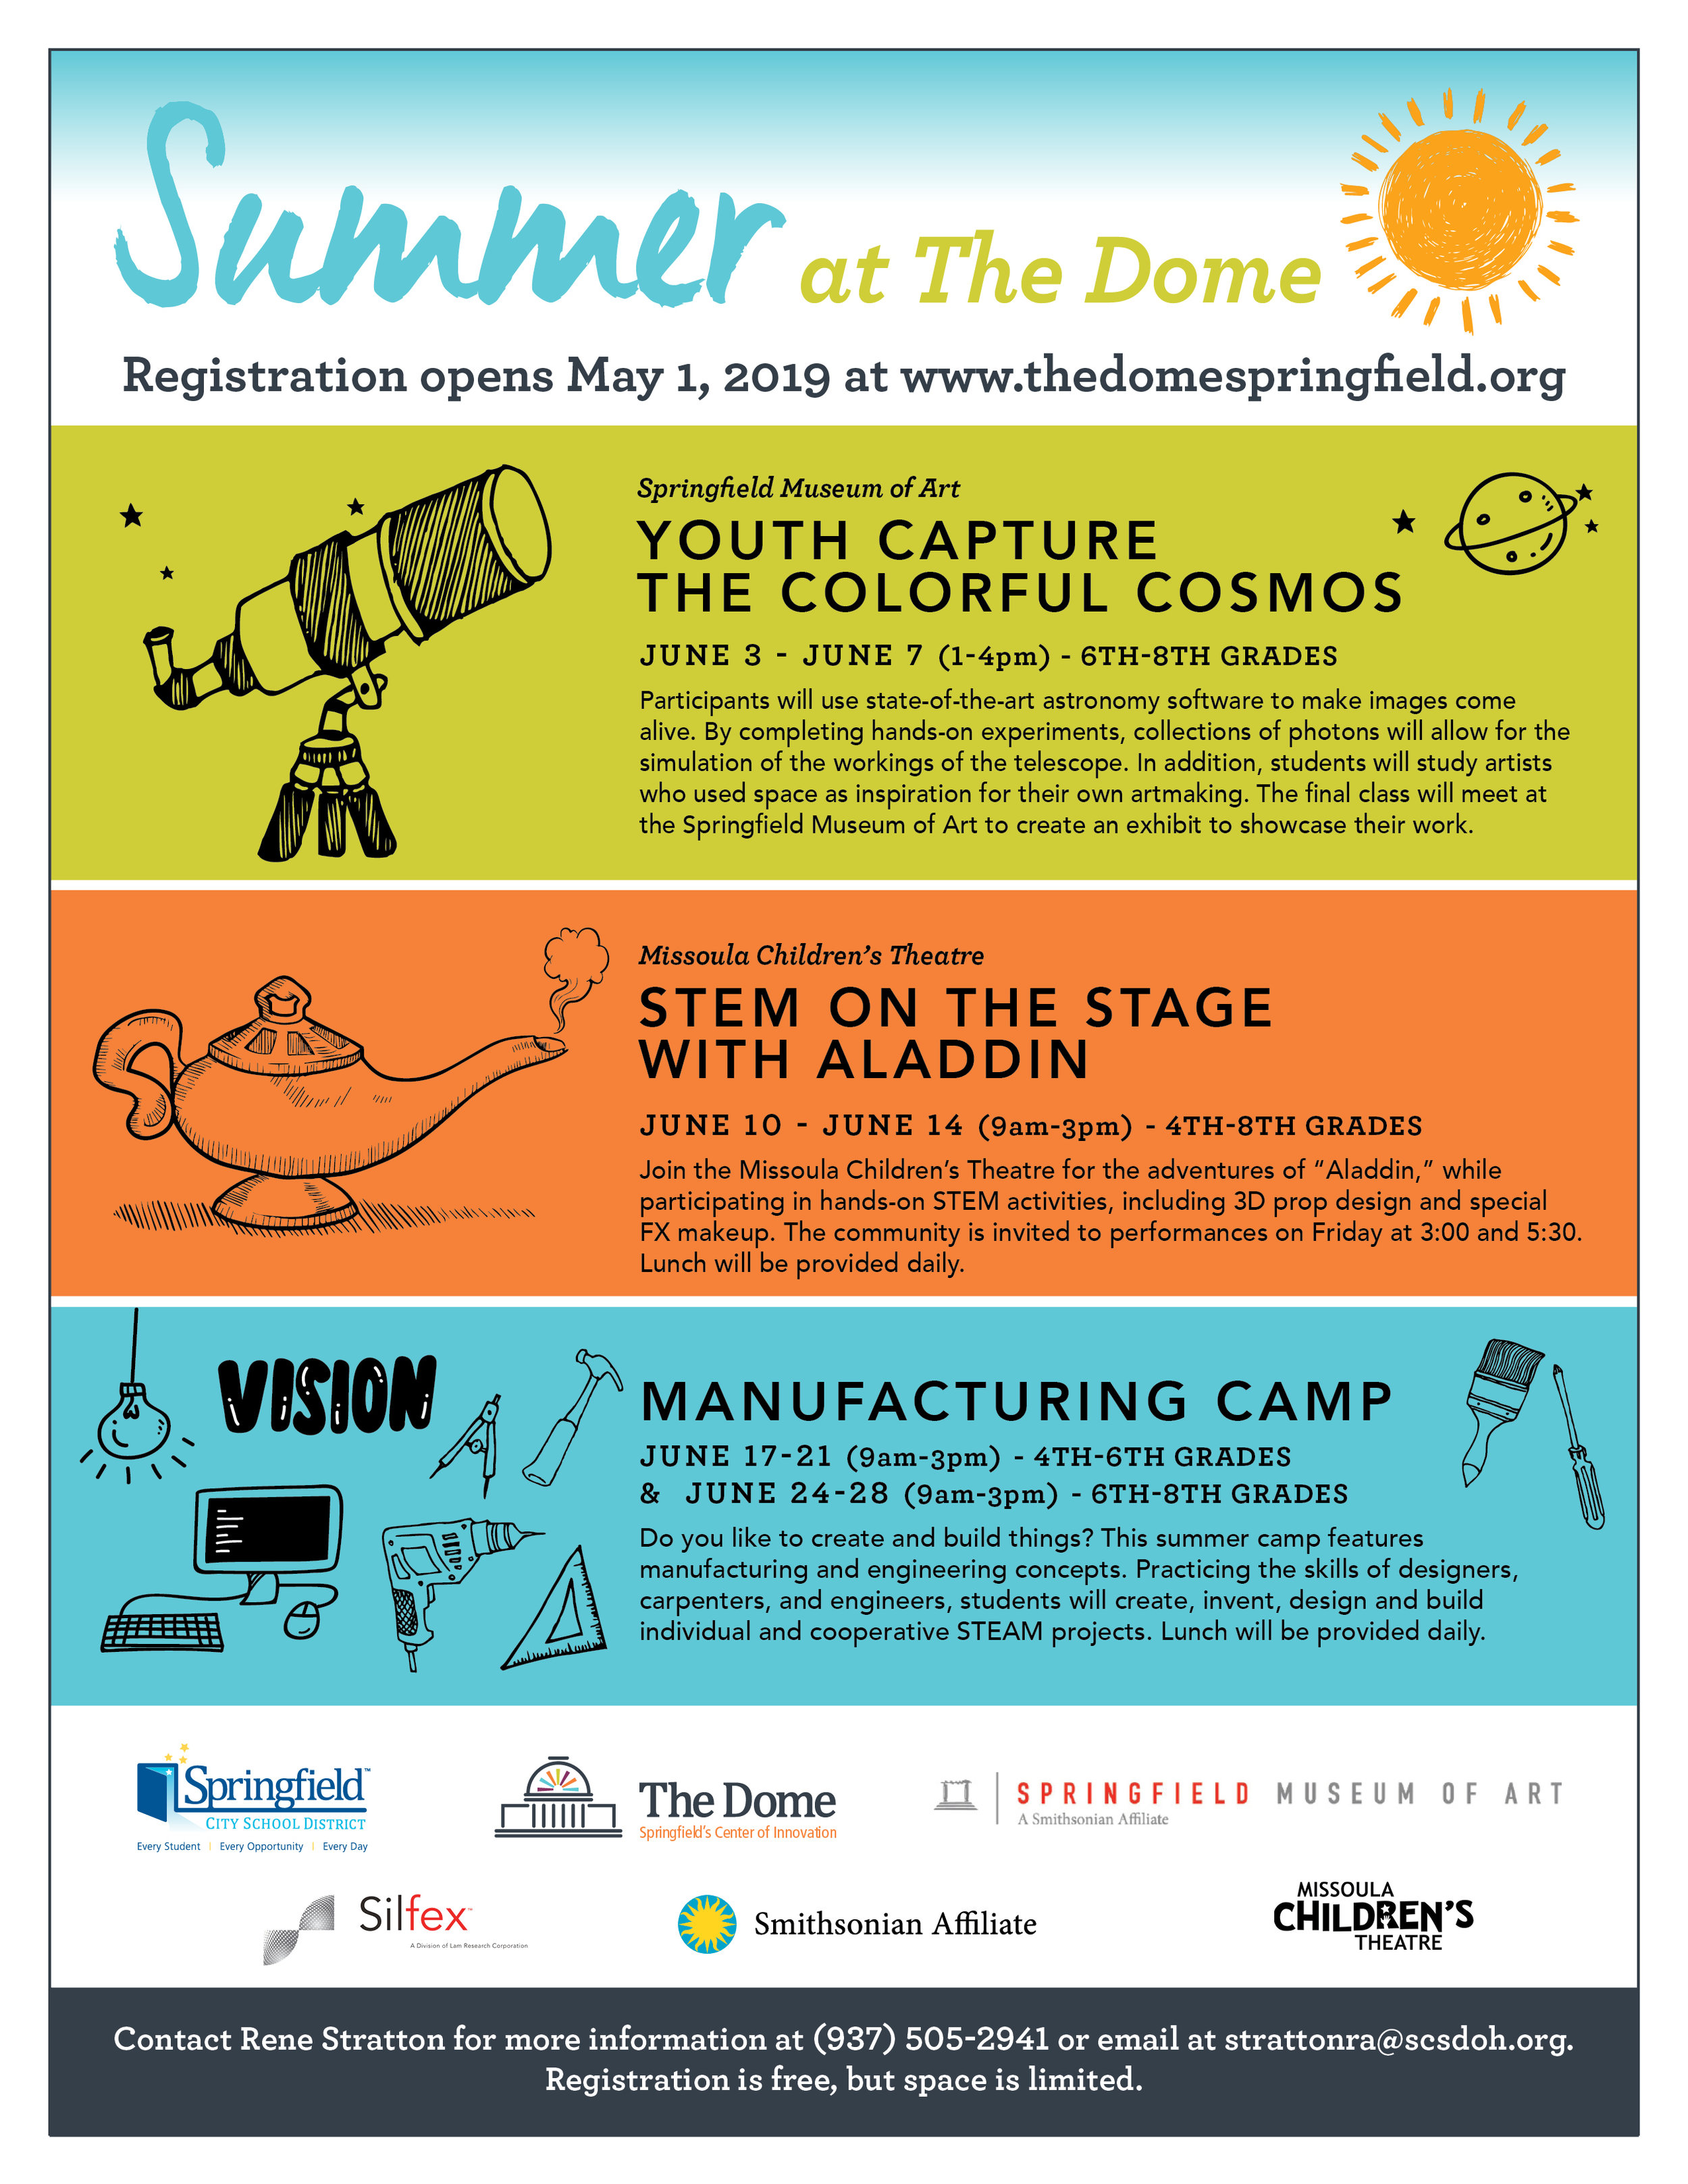 TheDome_SummerProgram_Flyer_April2019_1.jpg